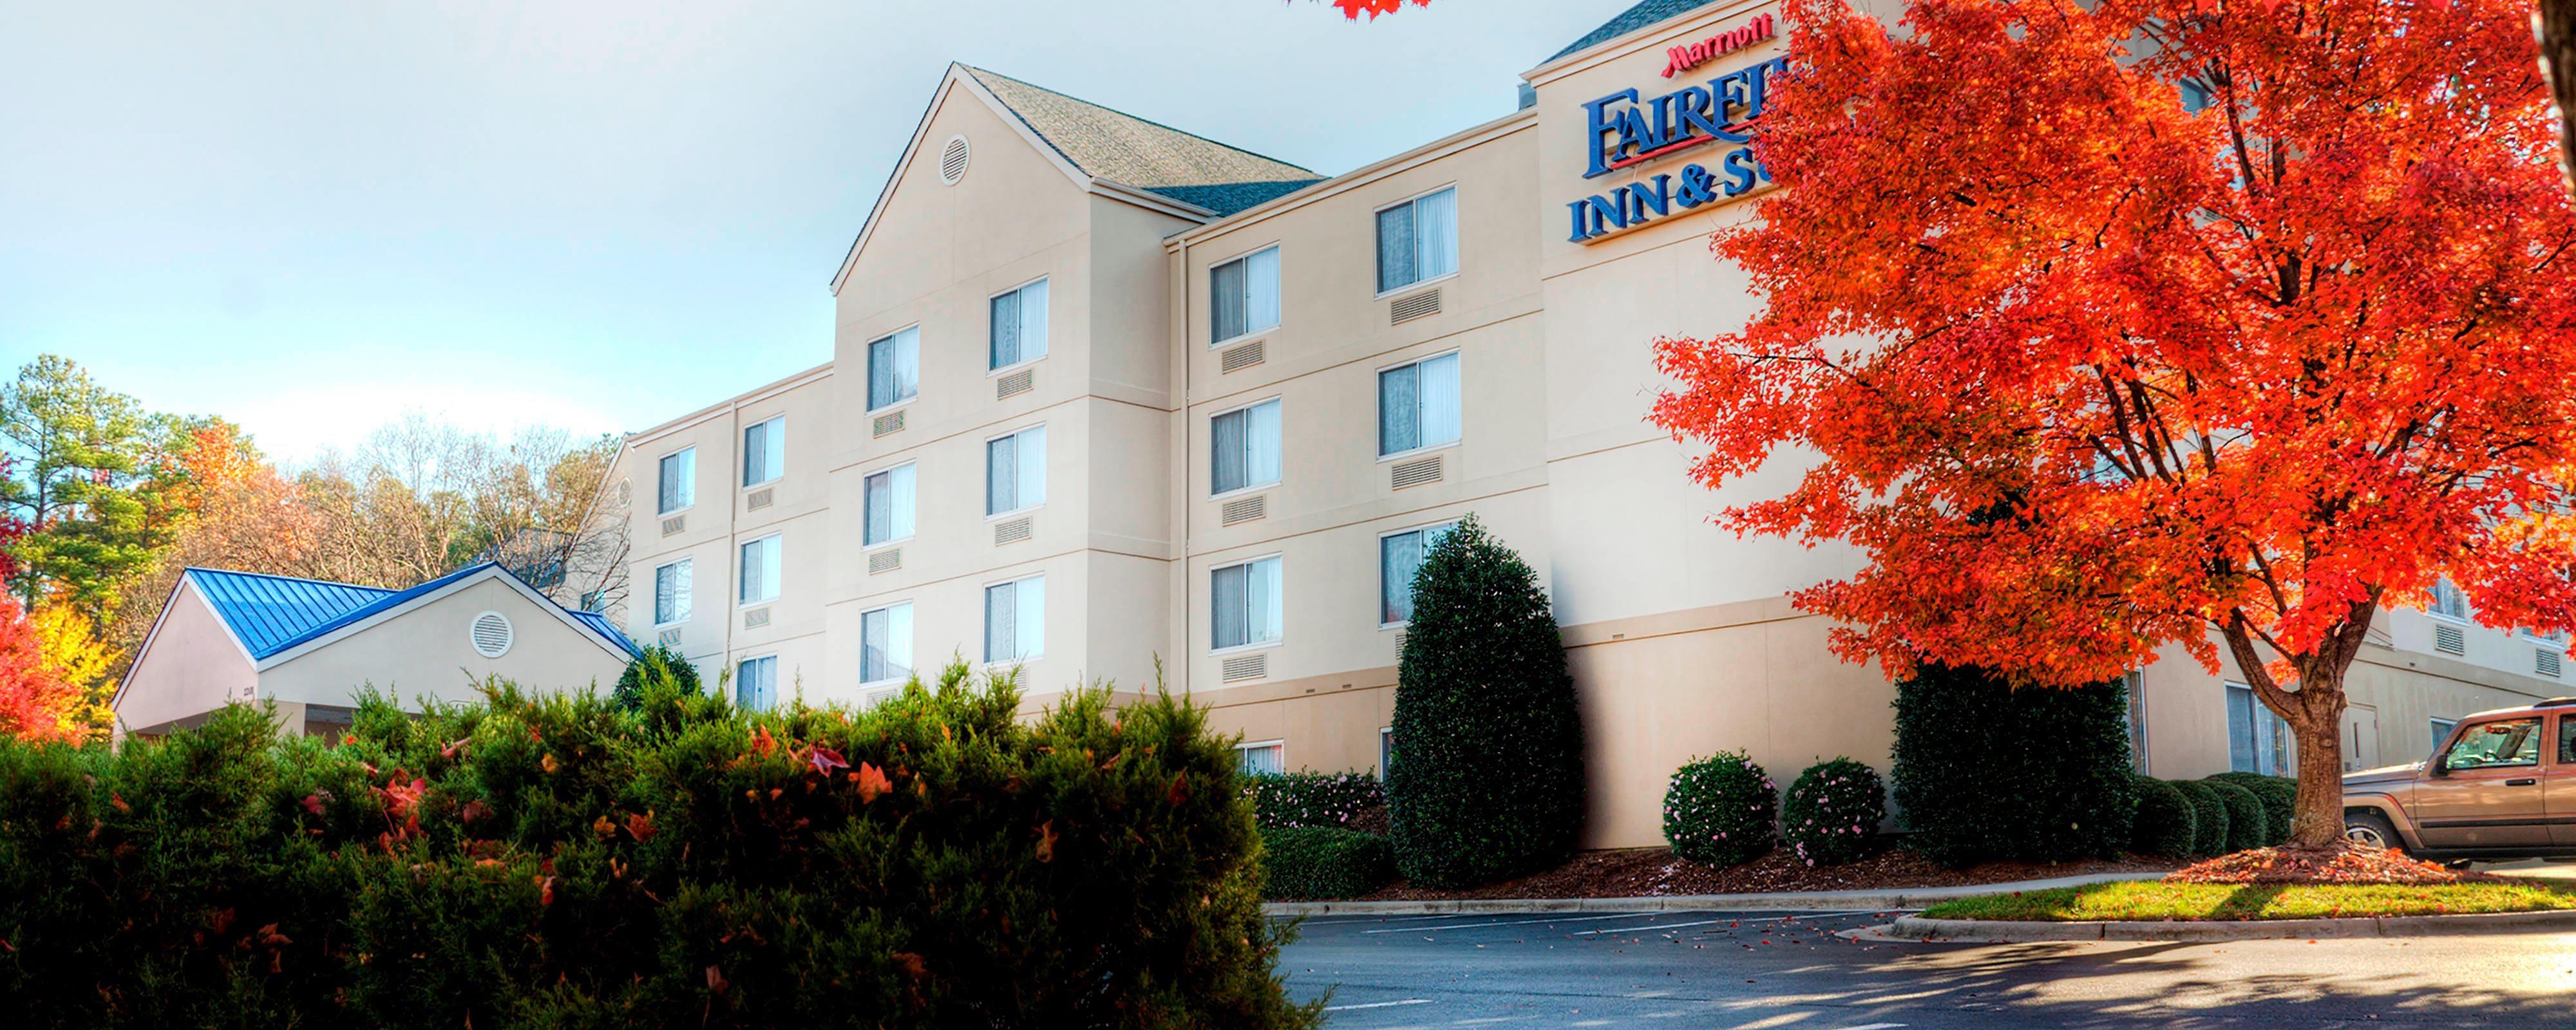 Hotel In Raleigh, Nc  Fairfield Inn  Suites Raleigh -4734